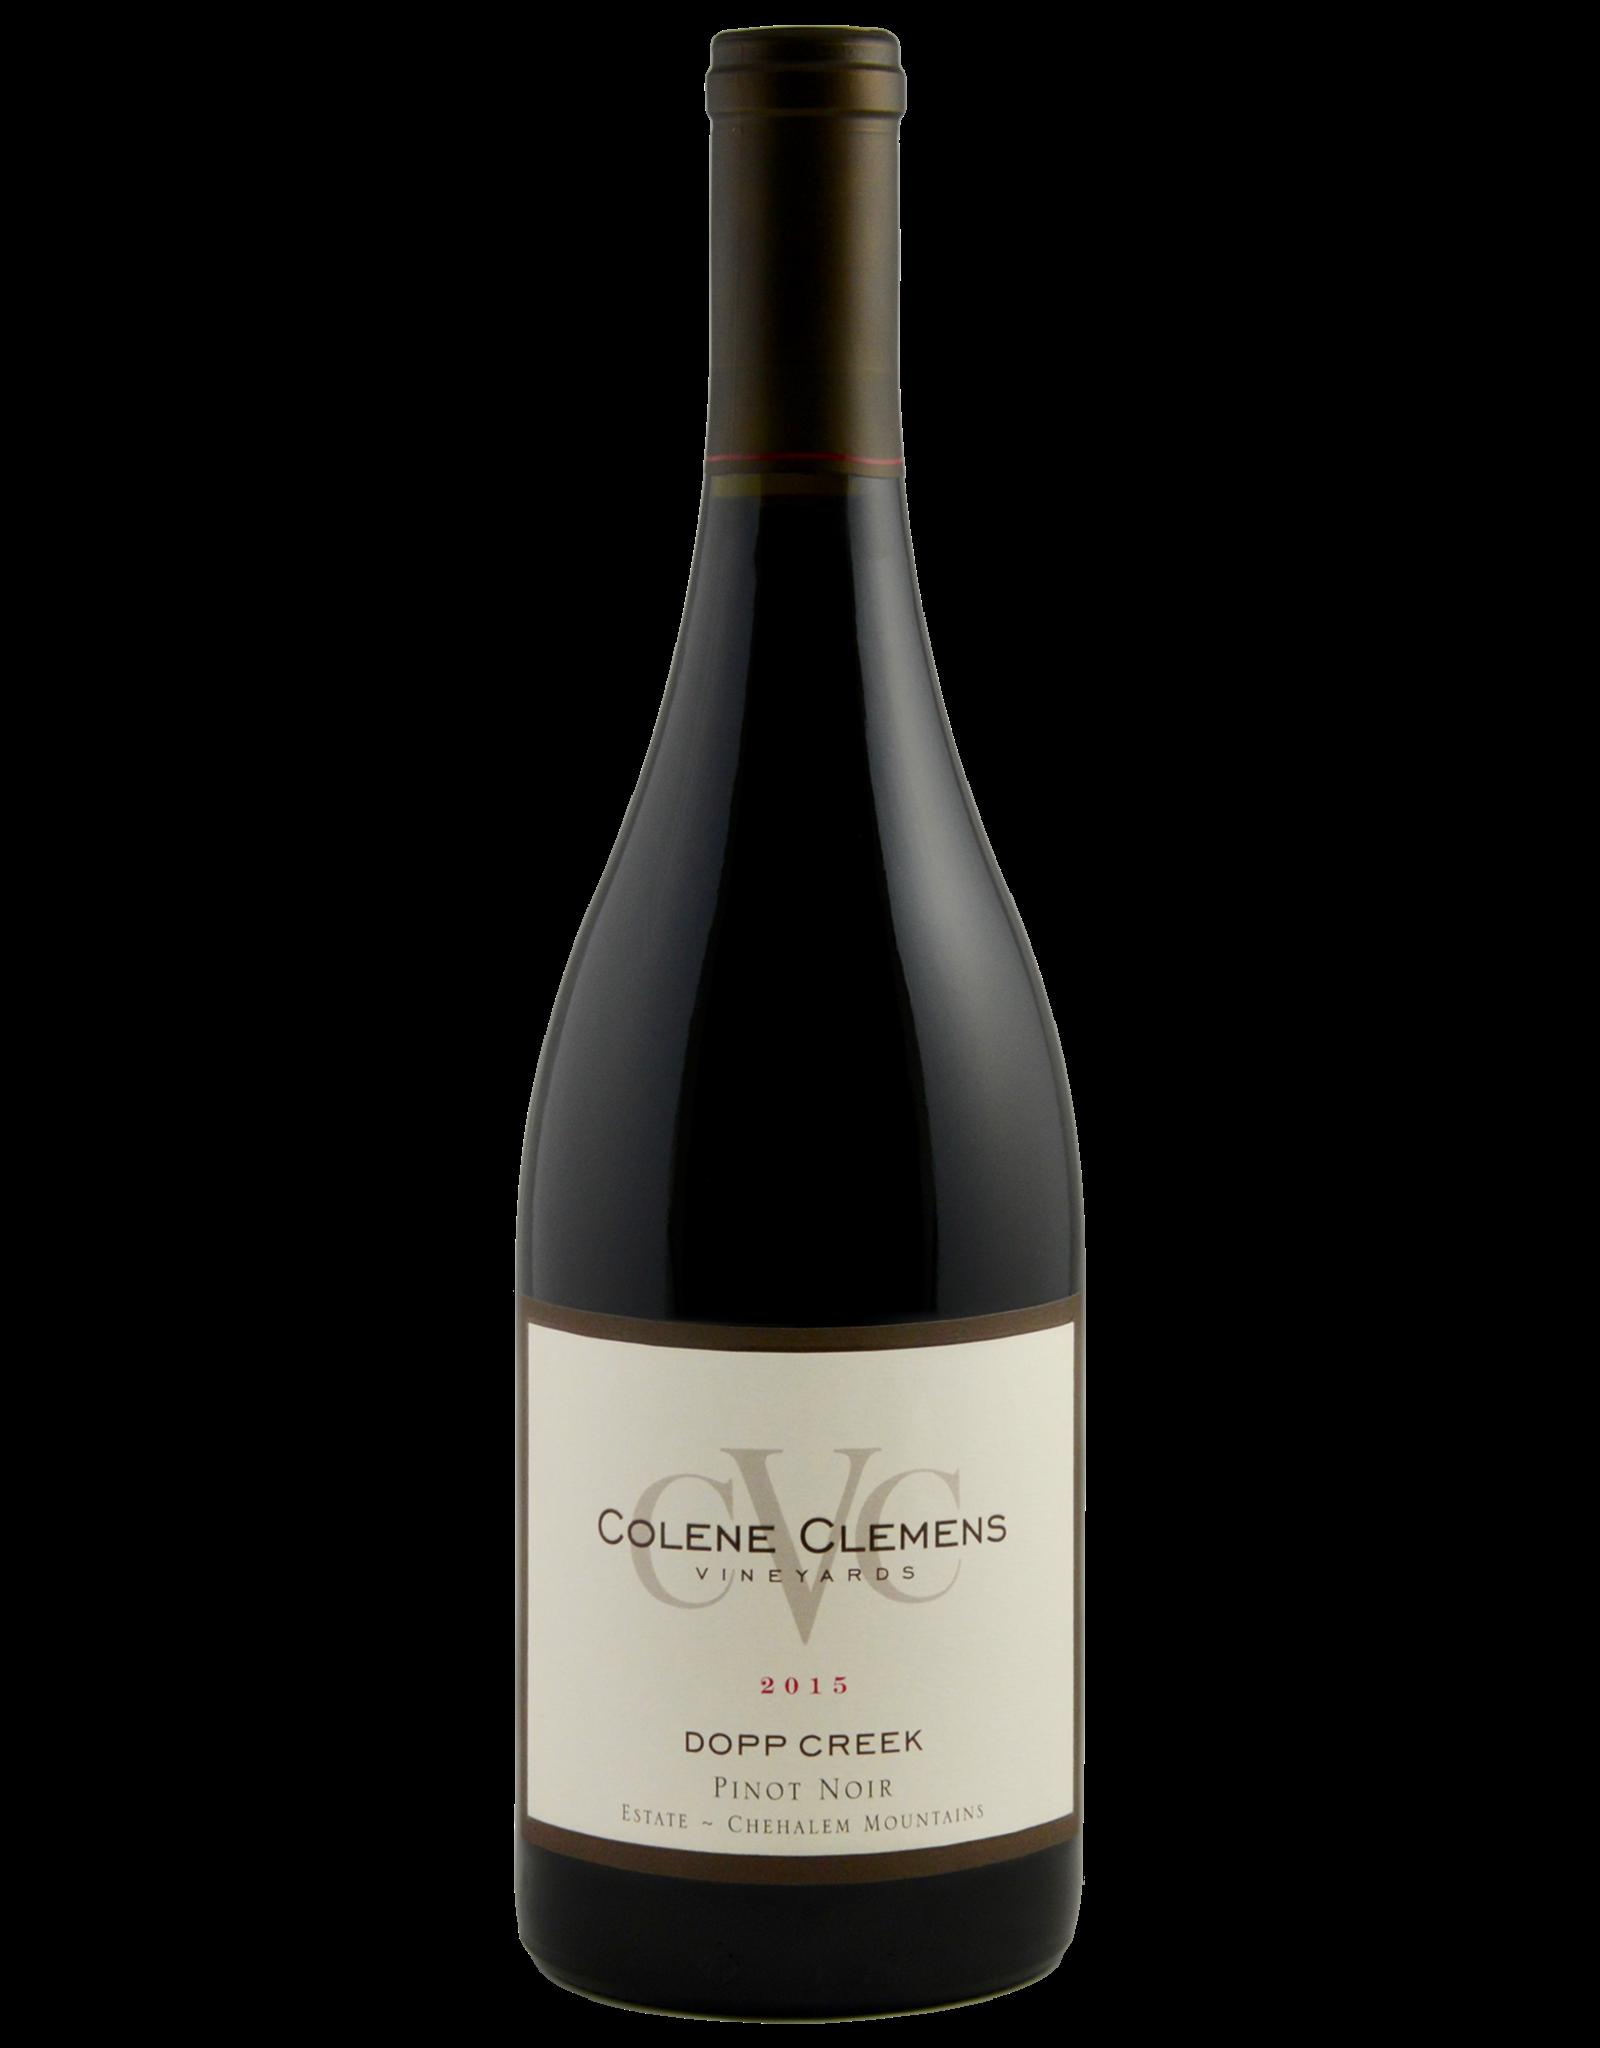 Colene Clemens Vineyards Dopp Creek Pinot Noir